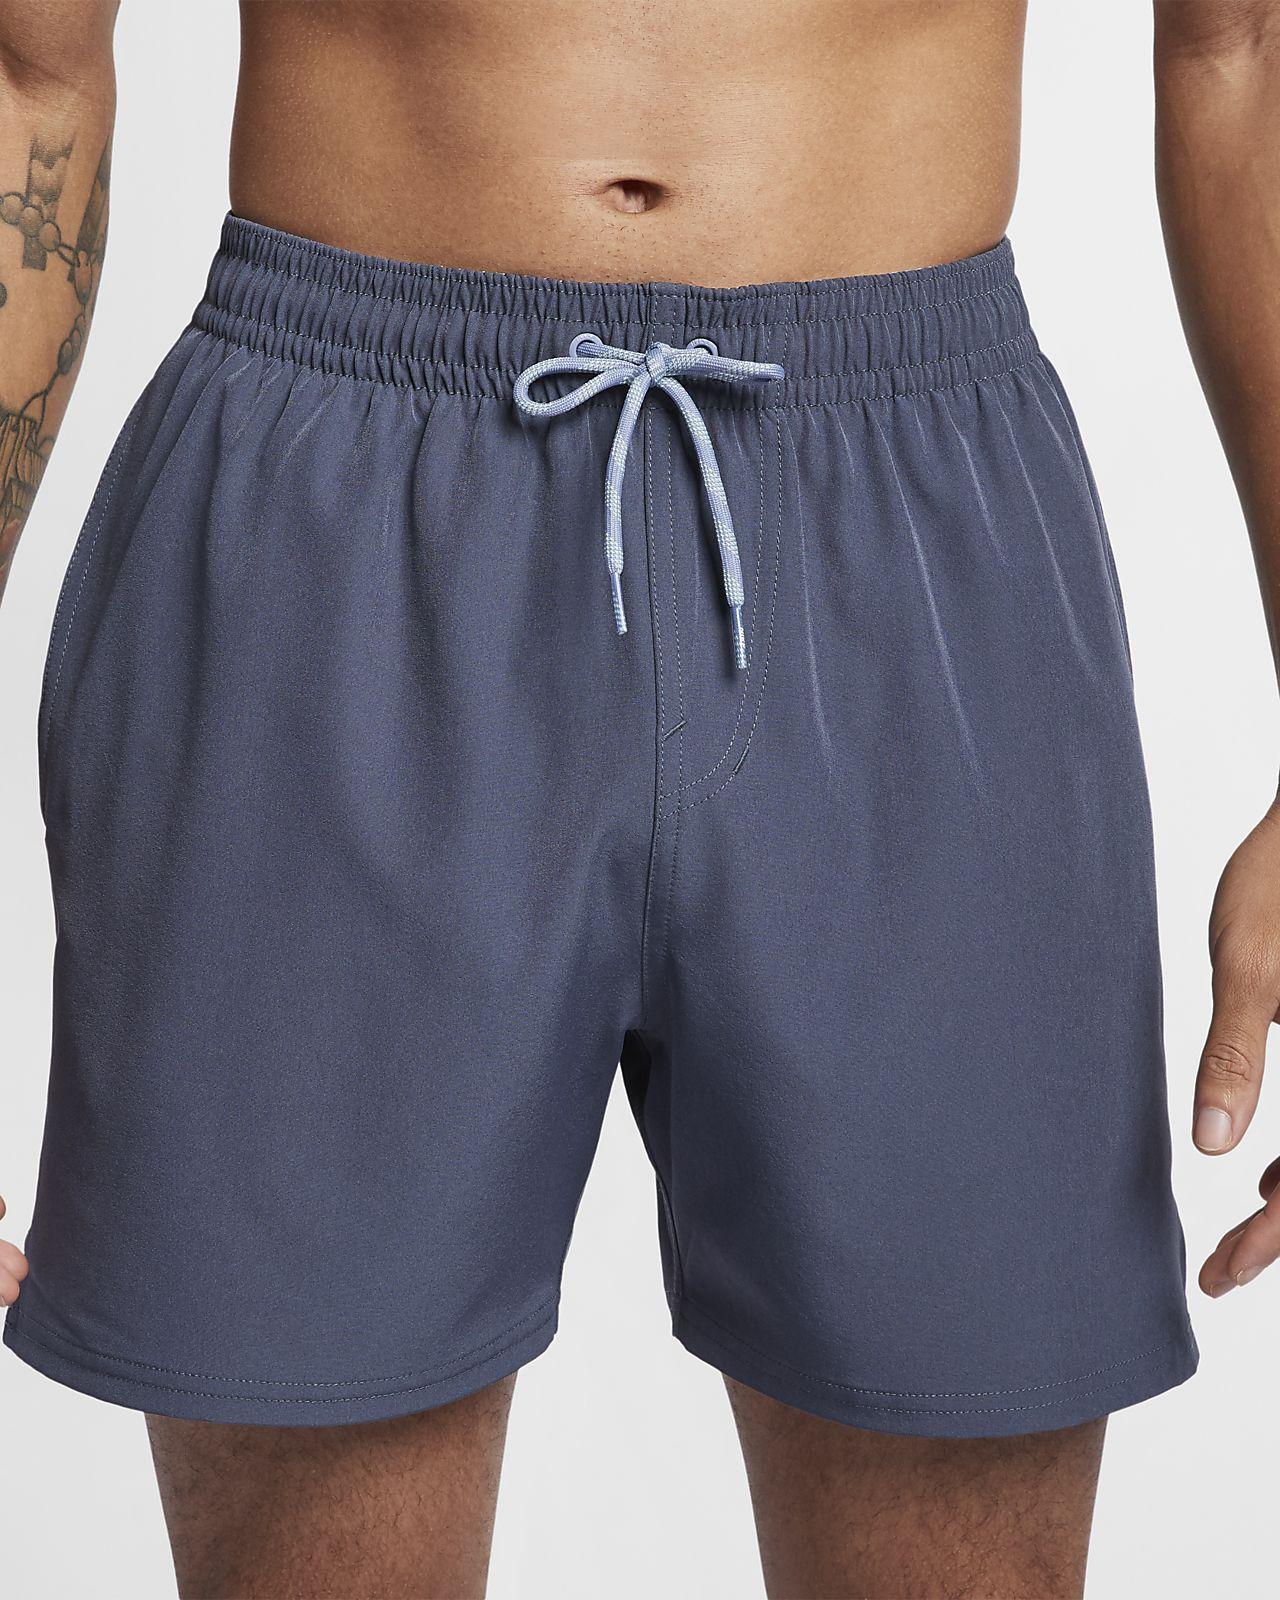 b8c32df6160f Nike Swim Retro Stripe Lap Bañador de 13 cm - Hombre